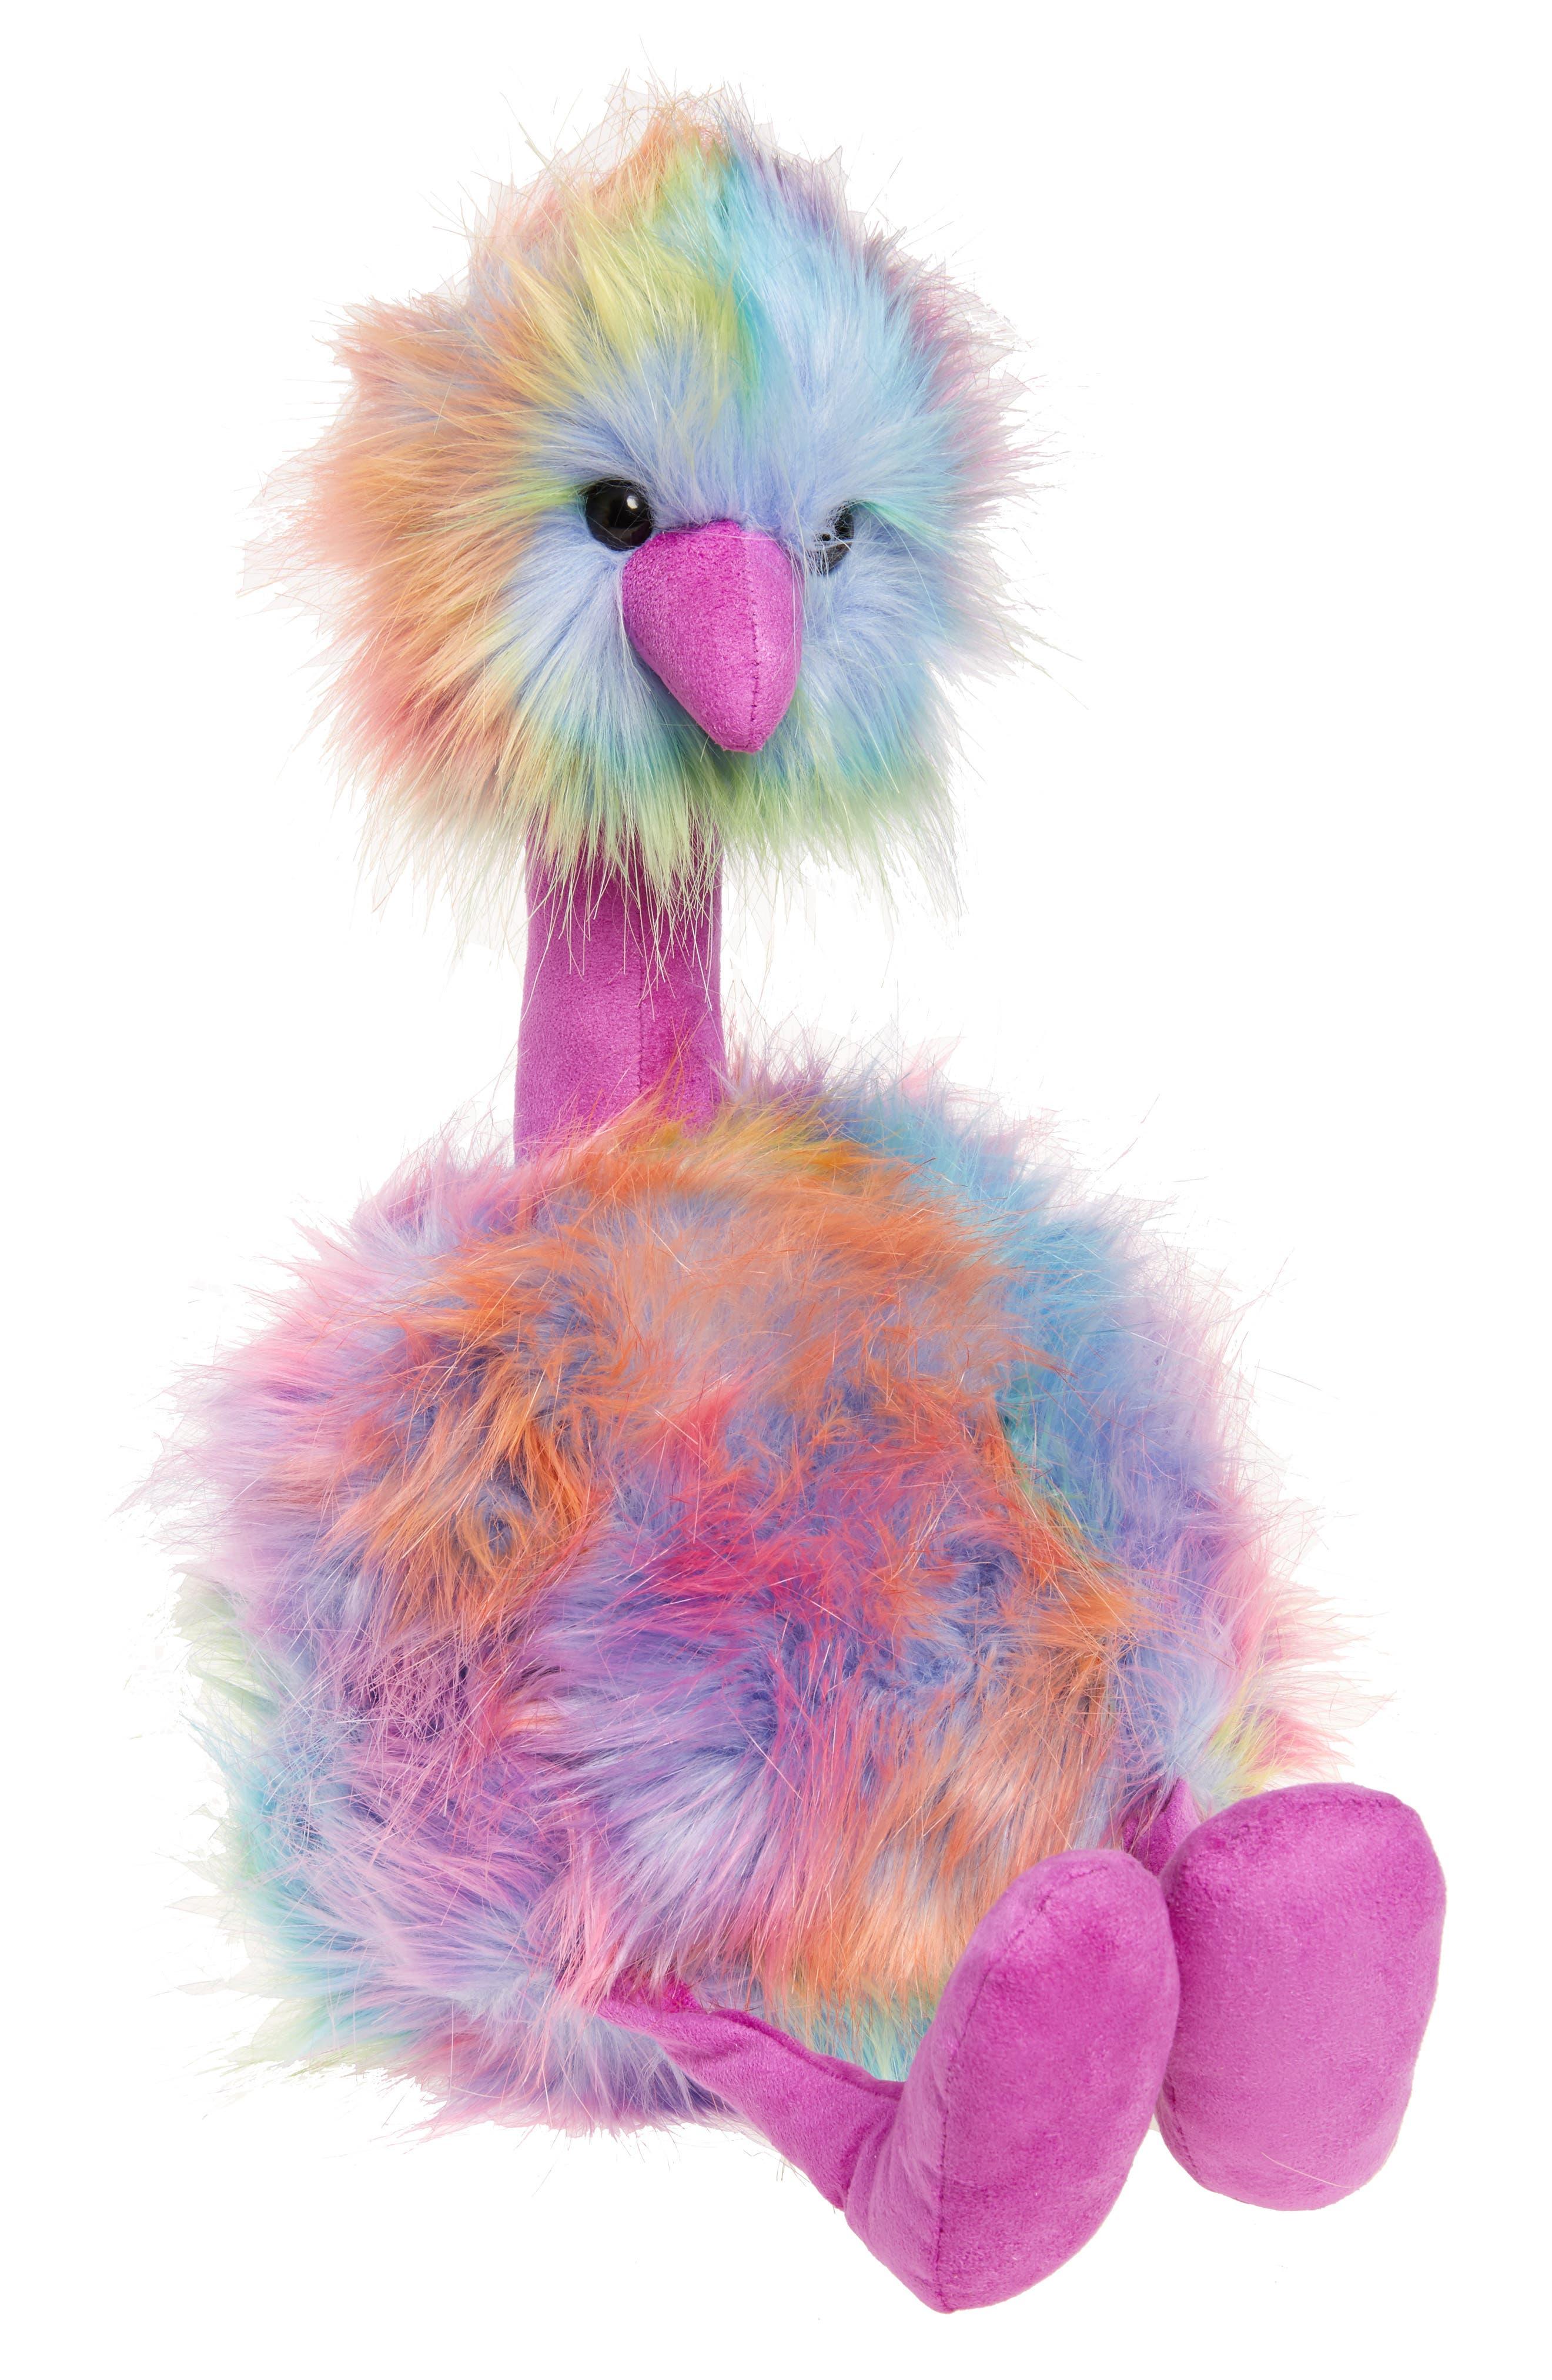 Alternate Image 1 Selected - Jellycat Large Pompom Rainbow Stuffed Animal